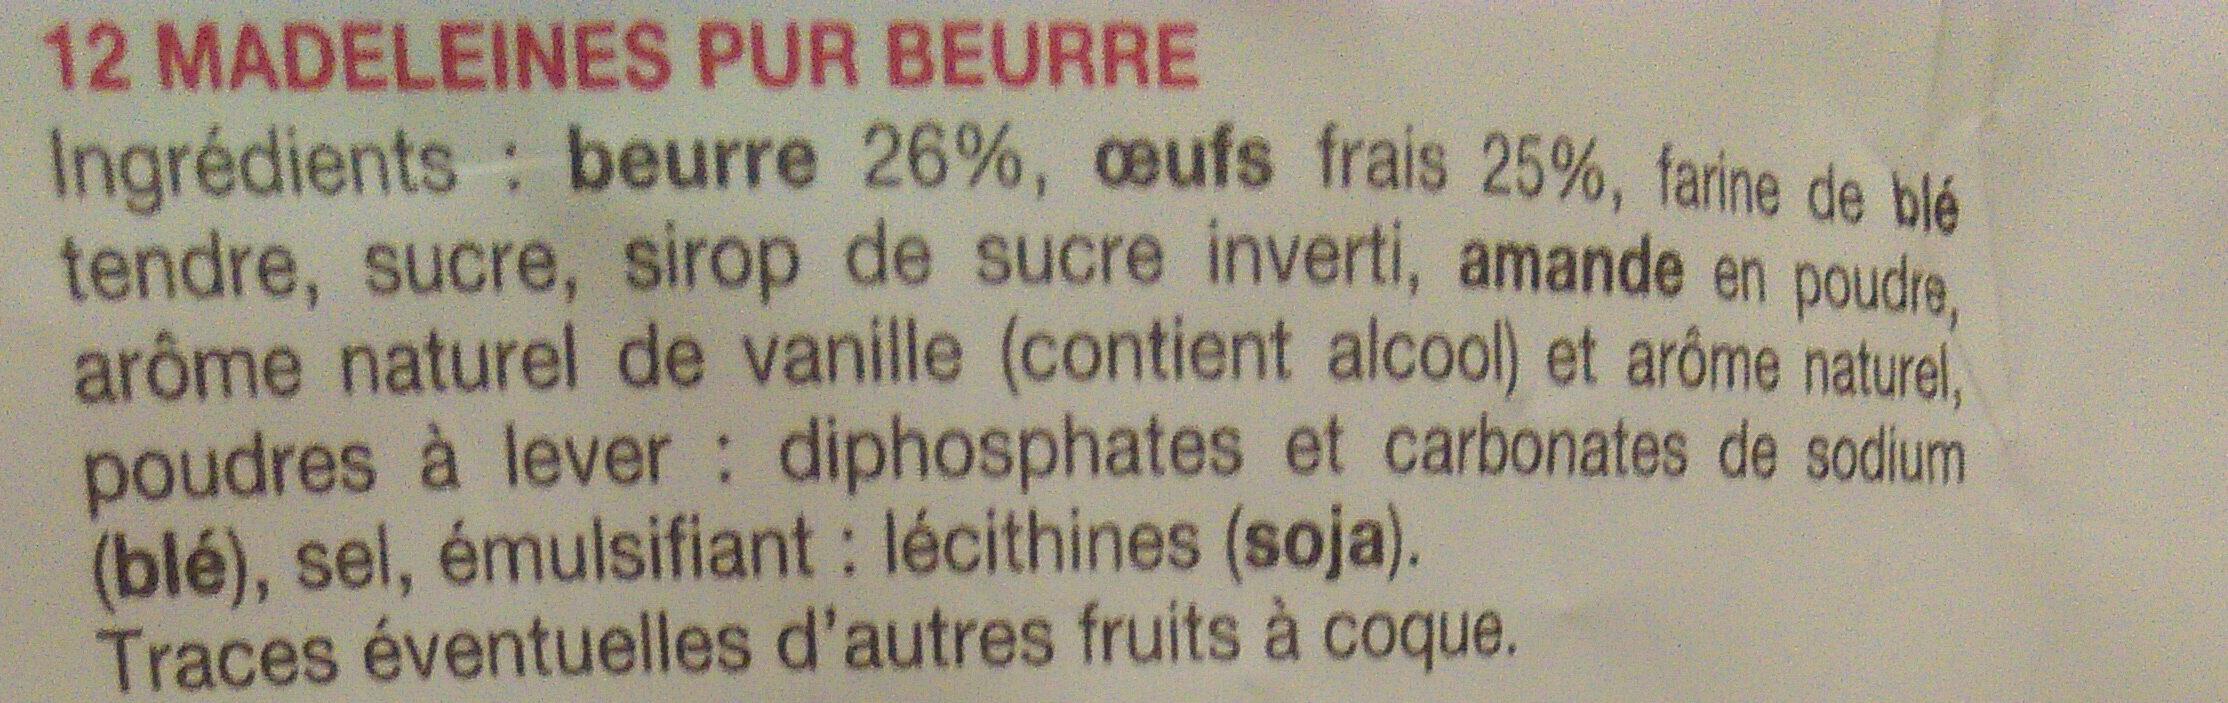 La Madeleine Pur beurre - Ingrédients - fr